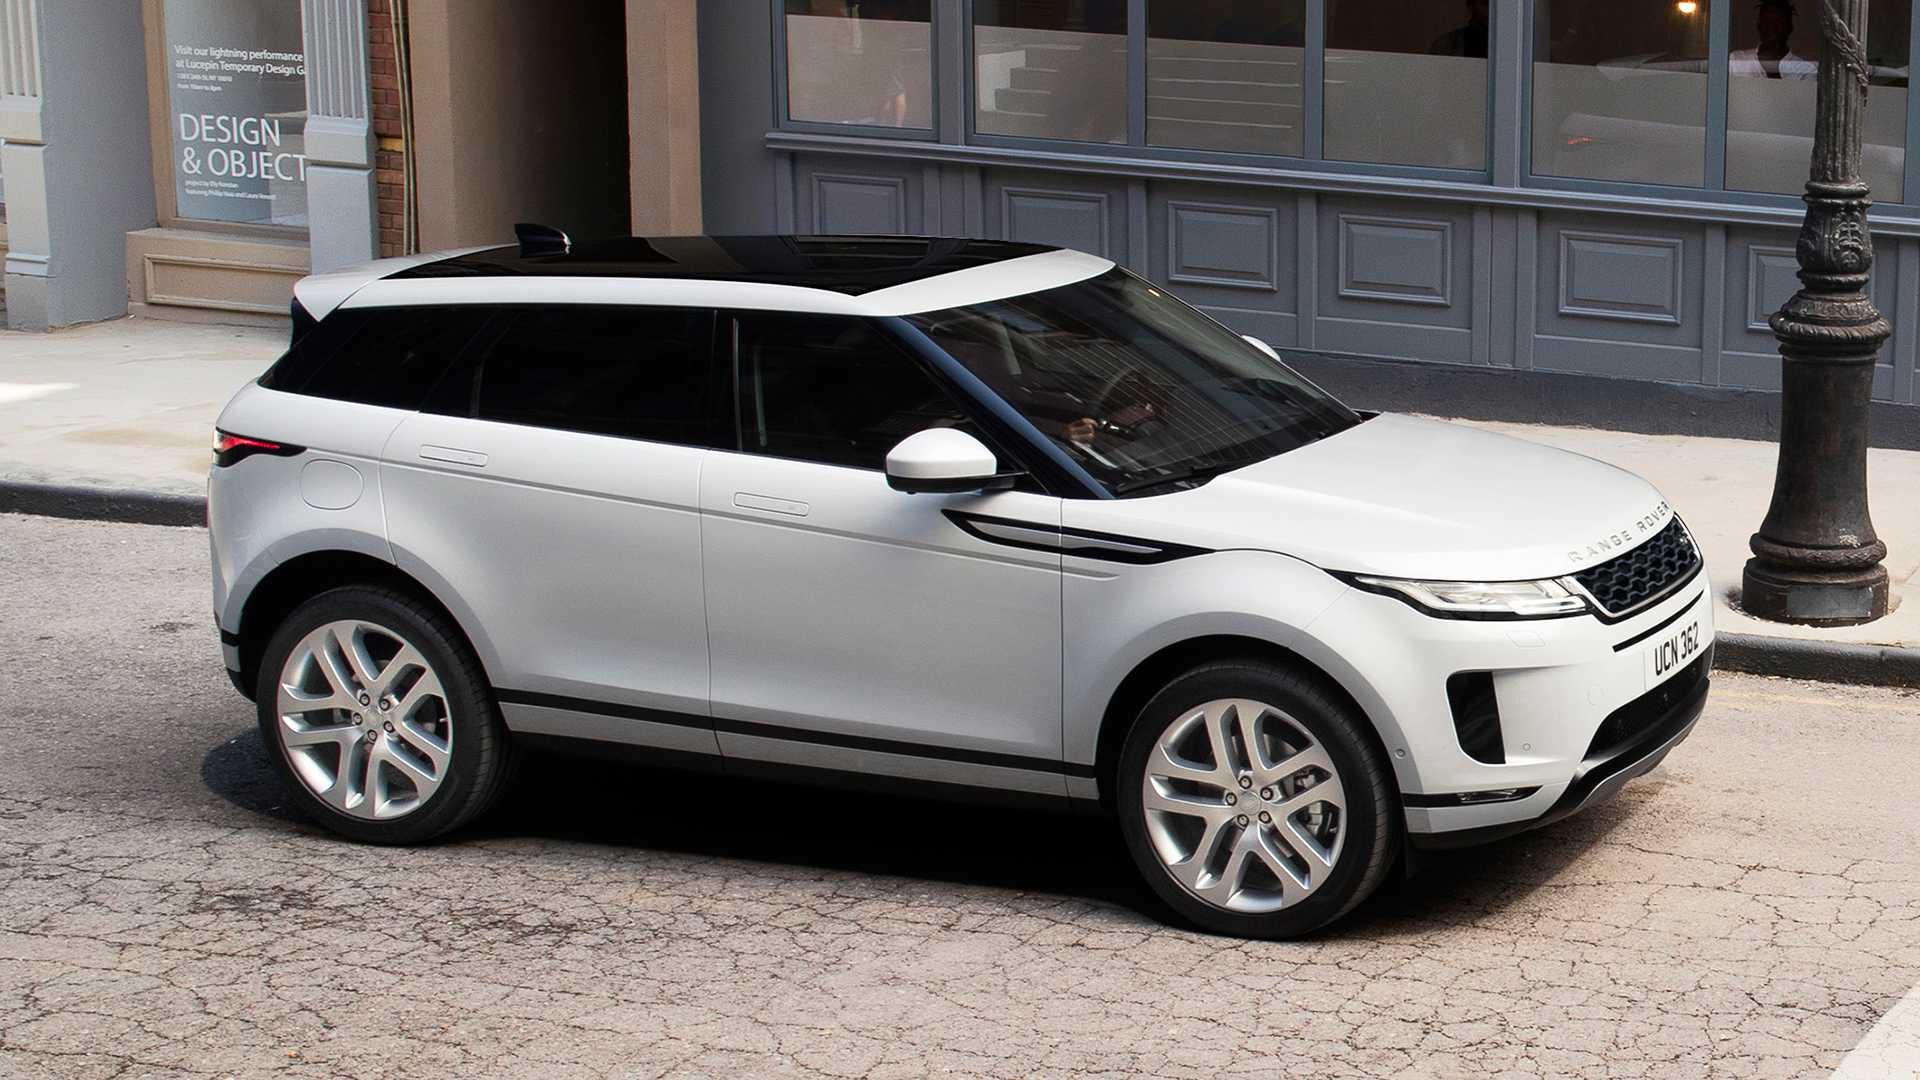 2020-range-rover-evoque (70)